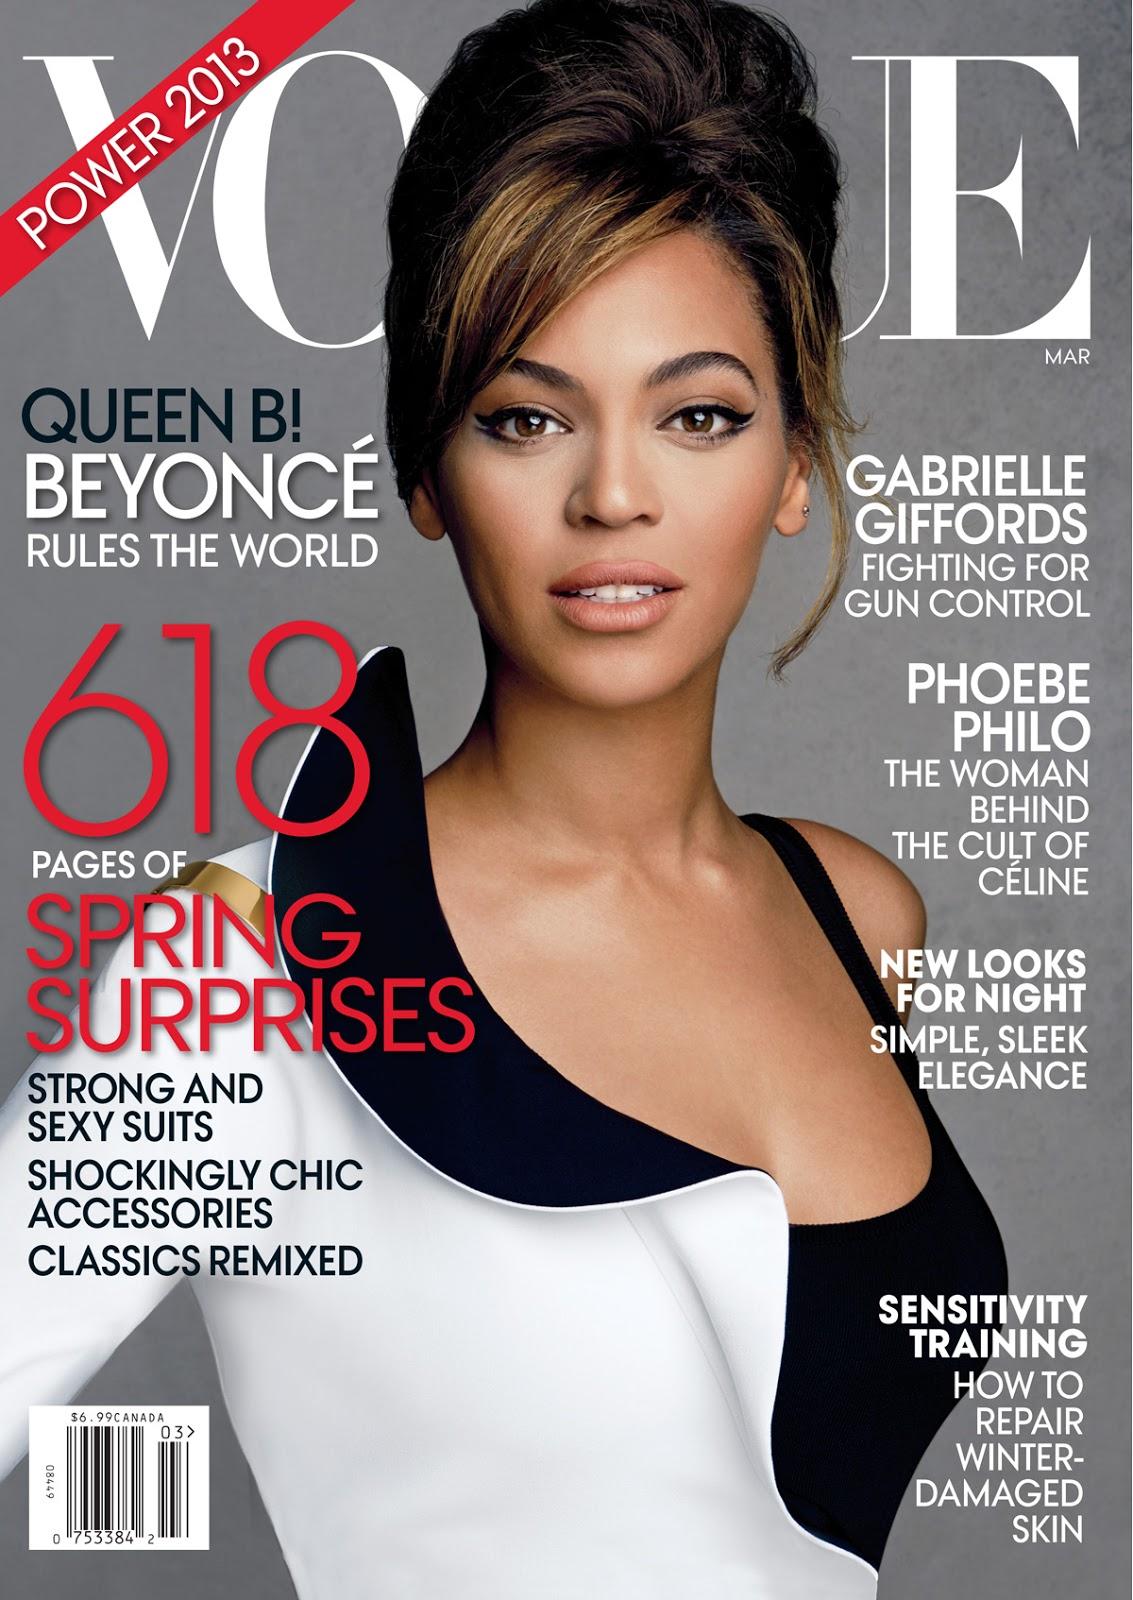 http://2.bp.blogspot.com/-ZG9meLBuTSw/URjvndFHwLI/AAAAAAABEdo/CaqUfli3WRA/s1600/Vogue-Magazine-March-2013-Beyonce-Cover.jpg